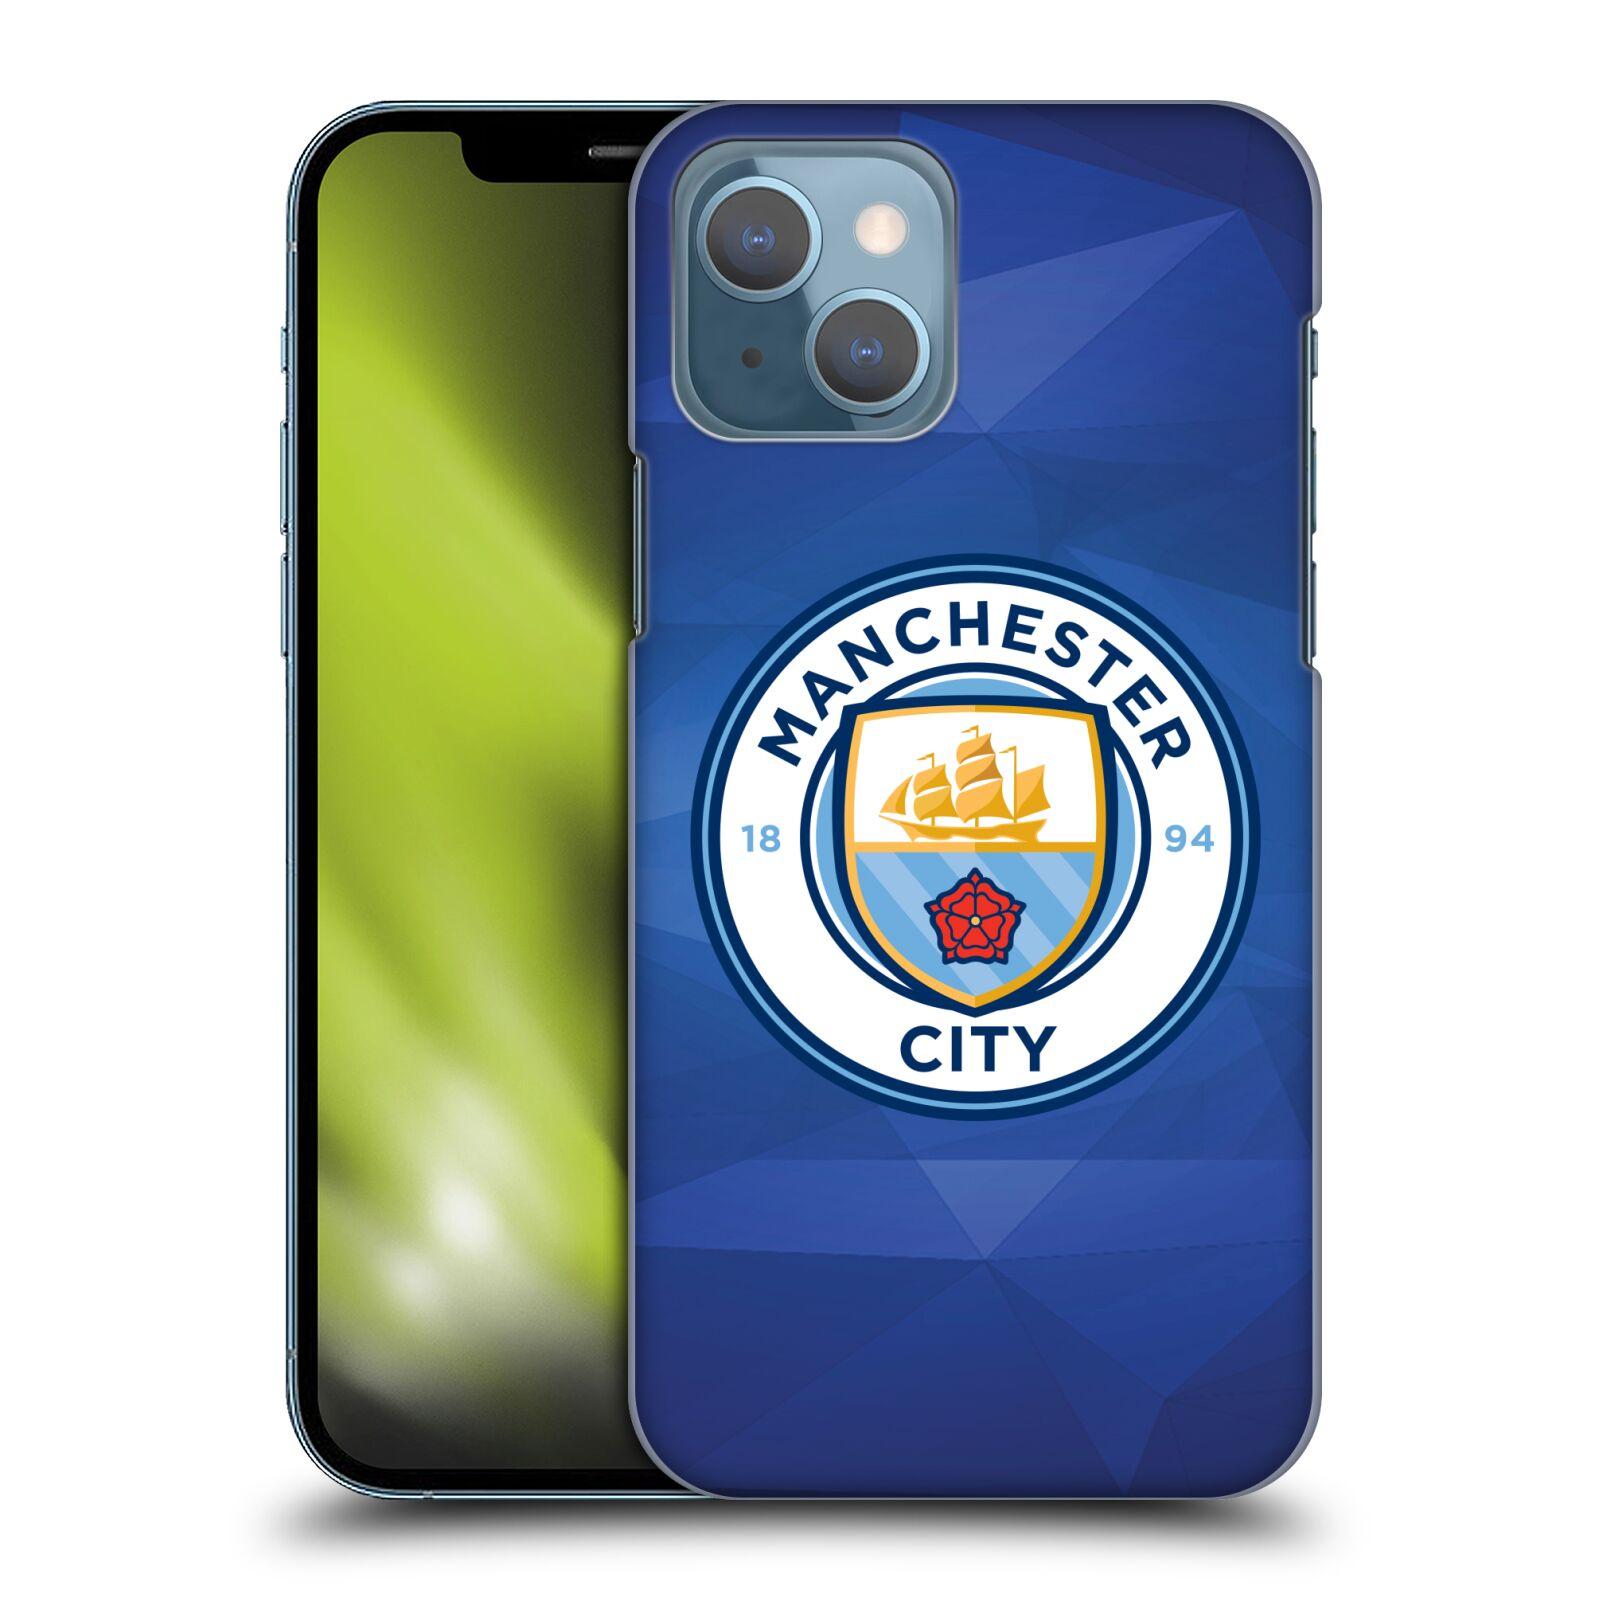 Plastové pouzdro na mobil Apple iPhone 13 - Head Case - Manchester City FC - Modré nové logo